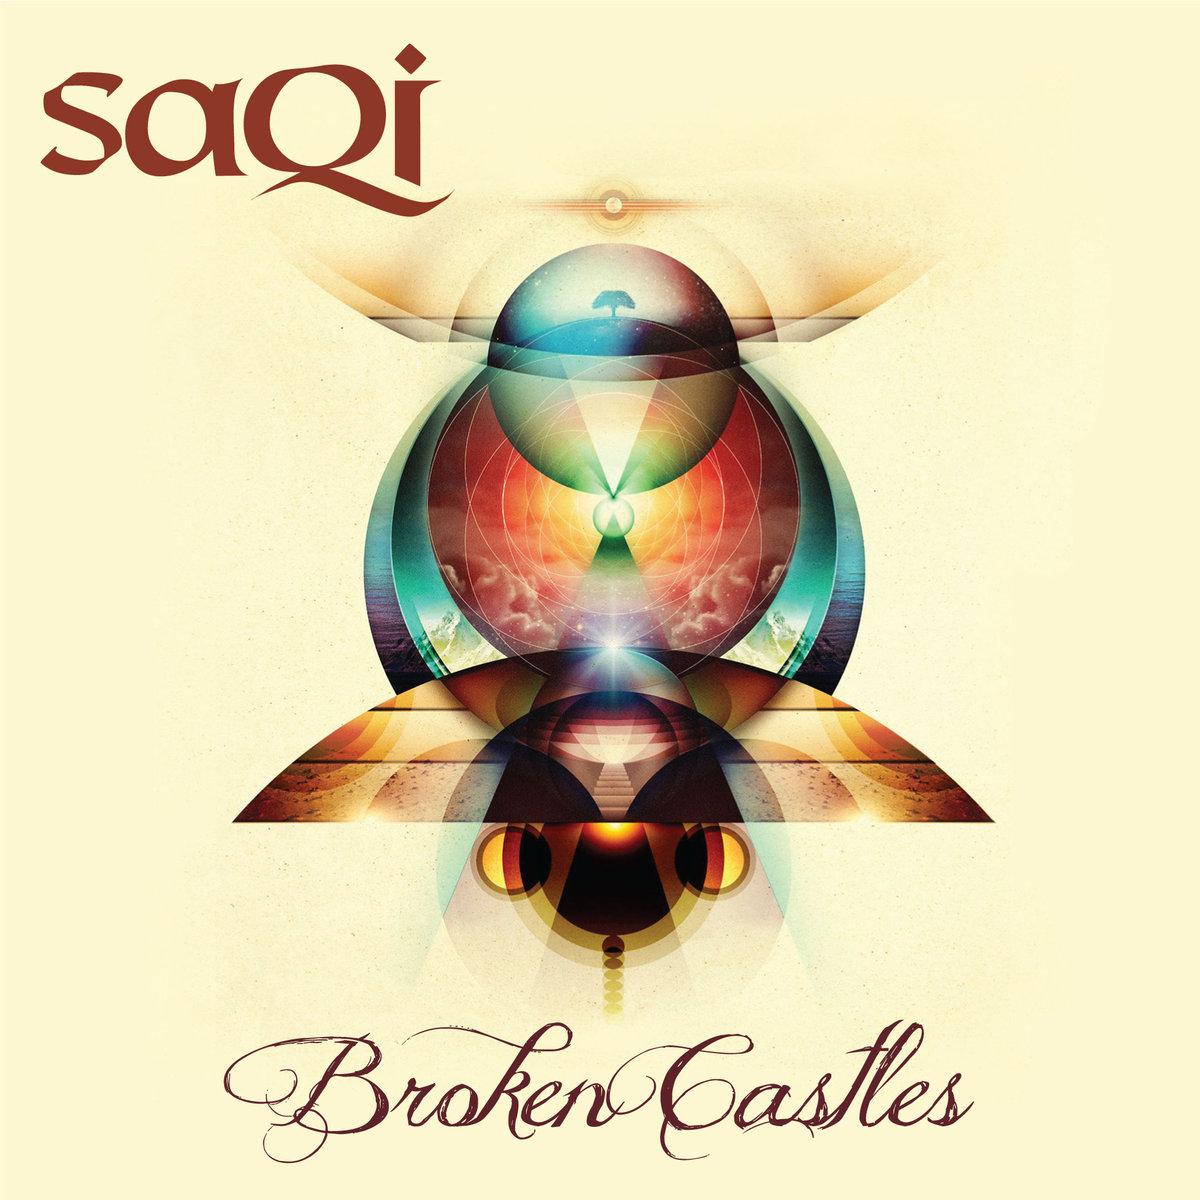 46. saQi - Broken Castles